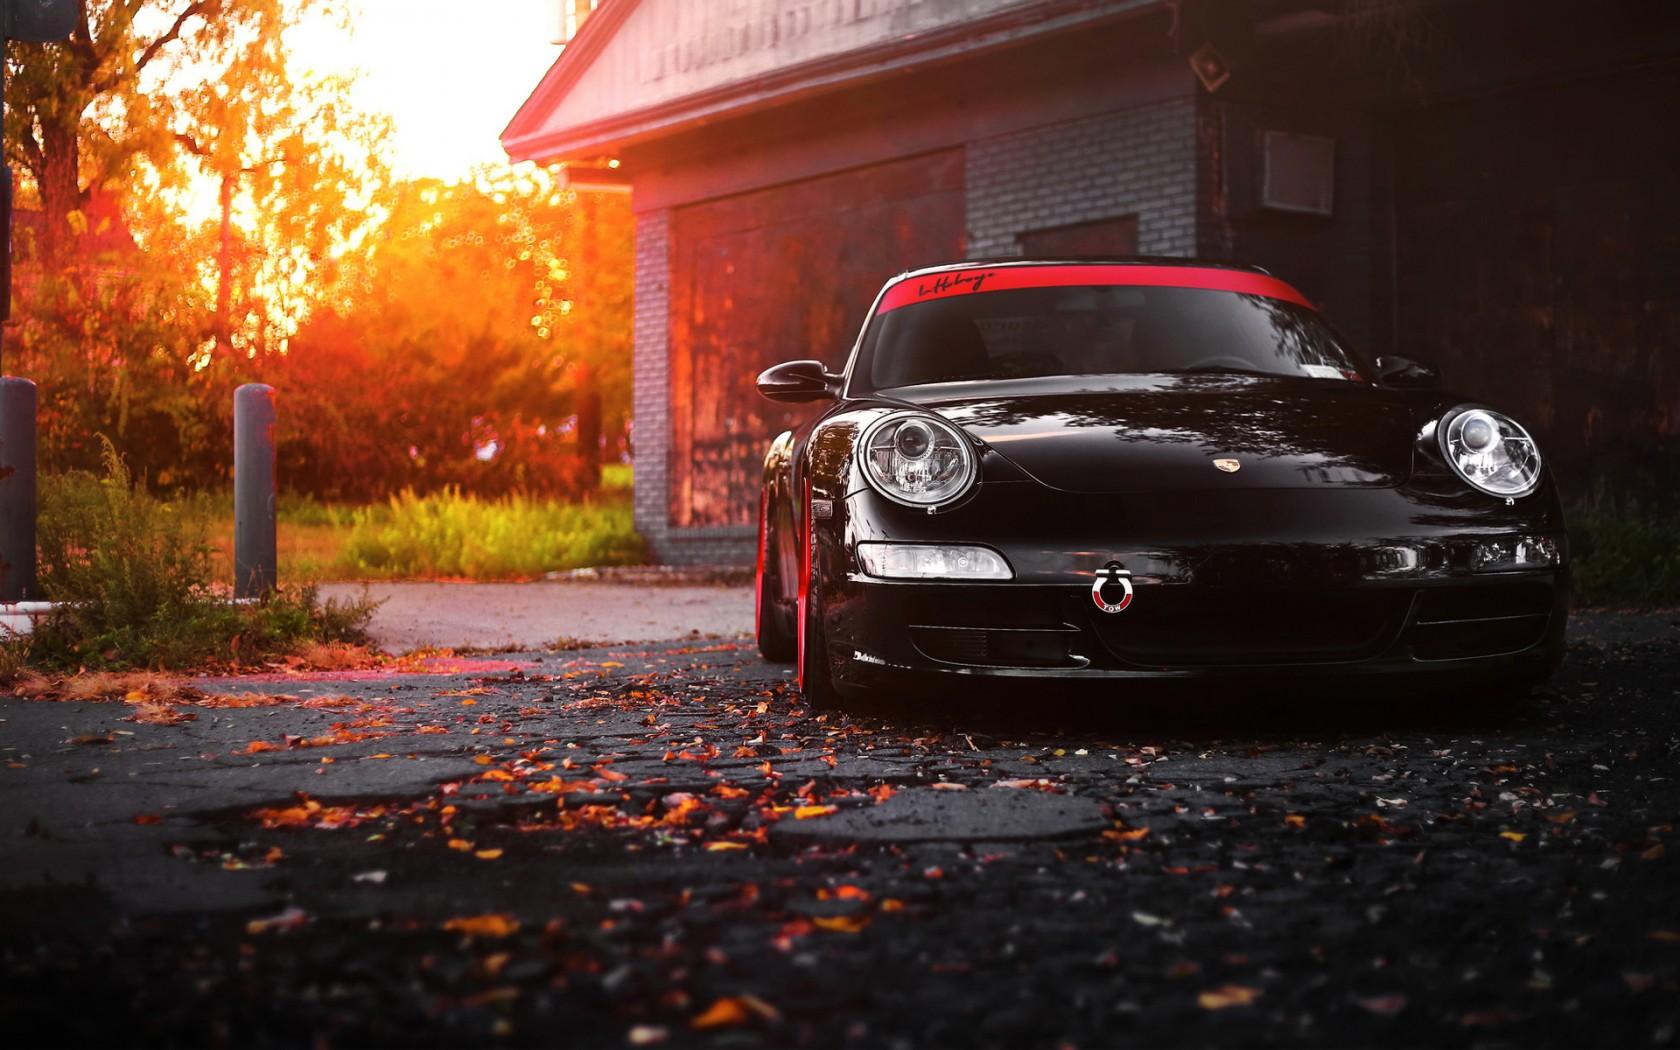 Wallpaper Pubg Black Porsche 911 Wallpaper Hd Car Wallpapers Id 6022